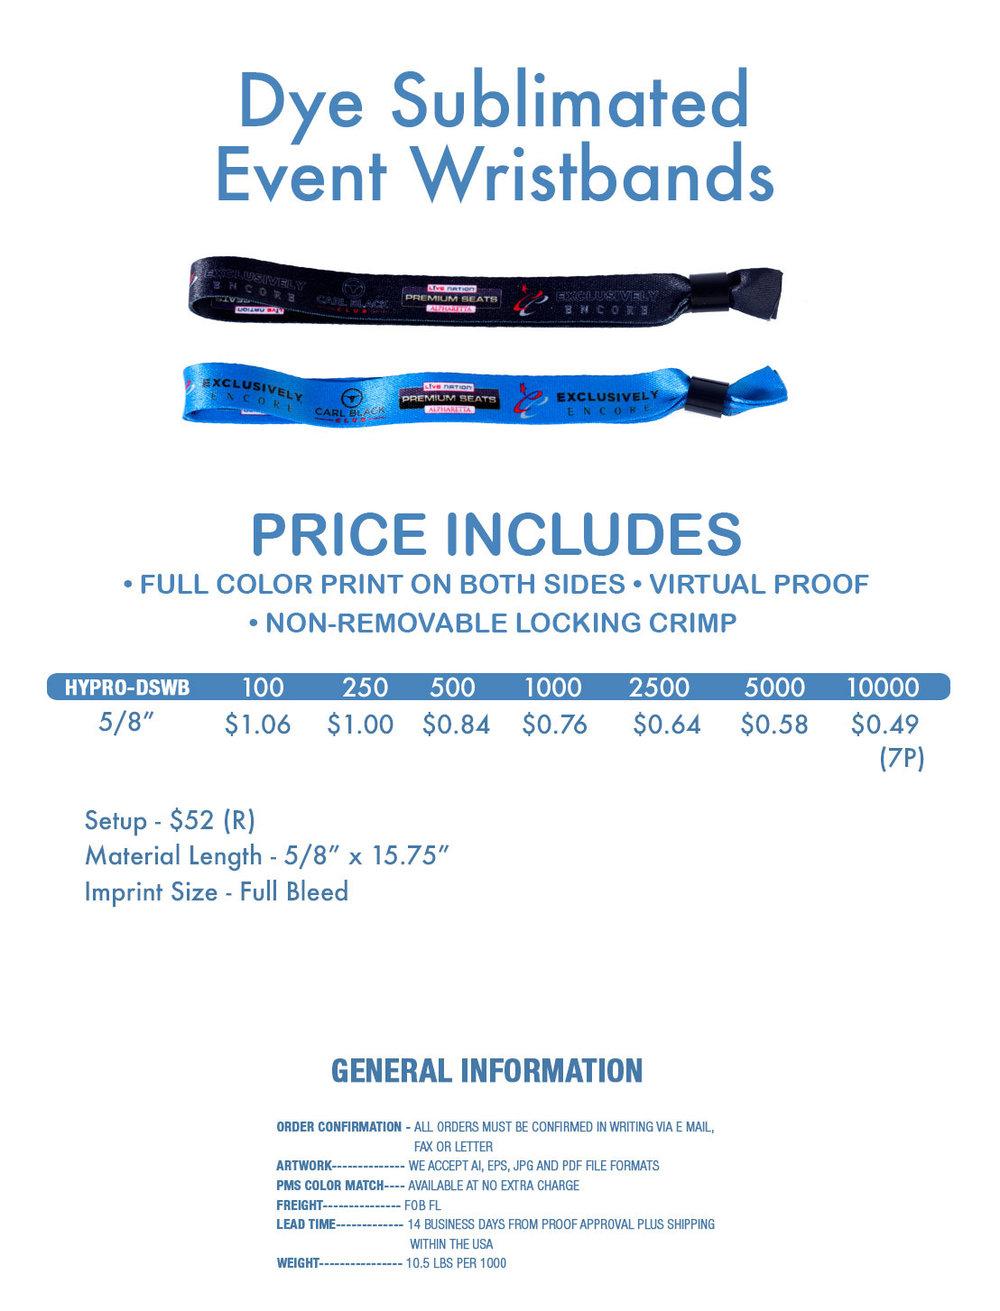 dye-sub-event-wristbands.jpg